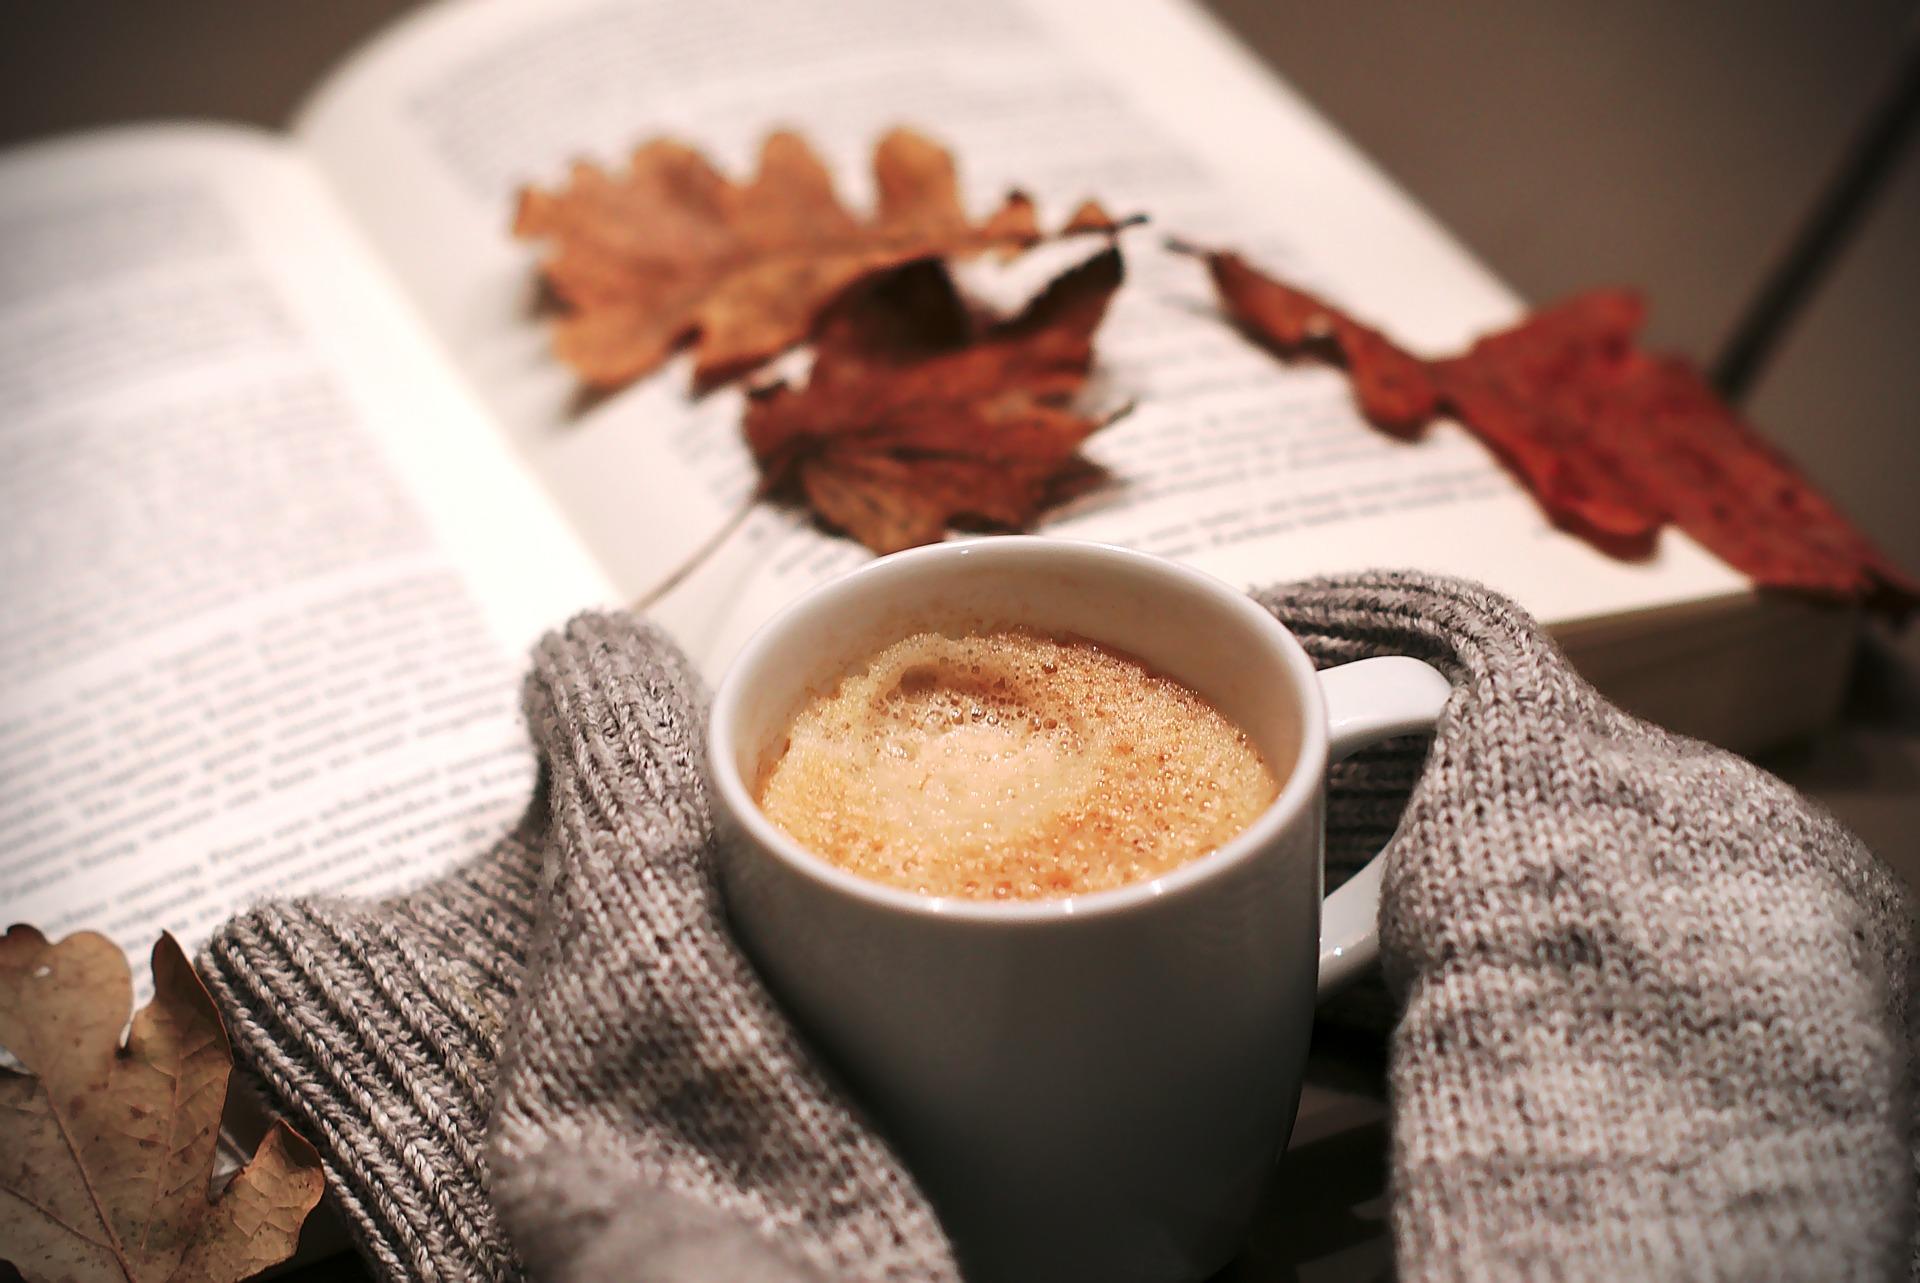 Books in Autumn.jpg